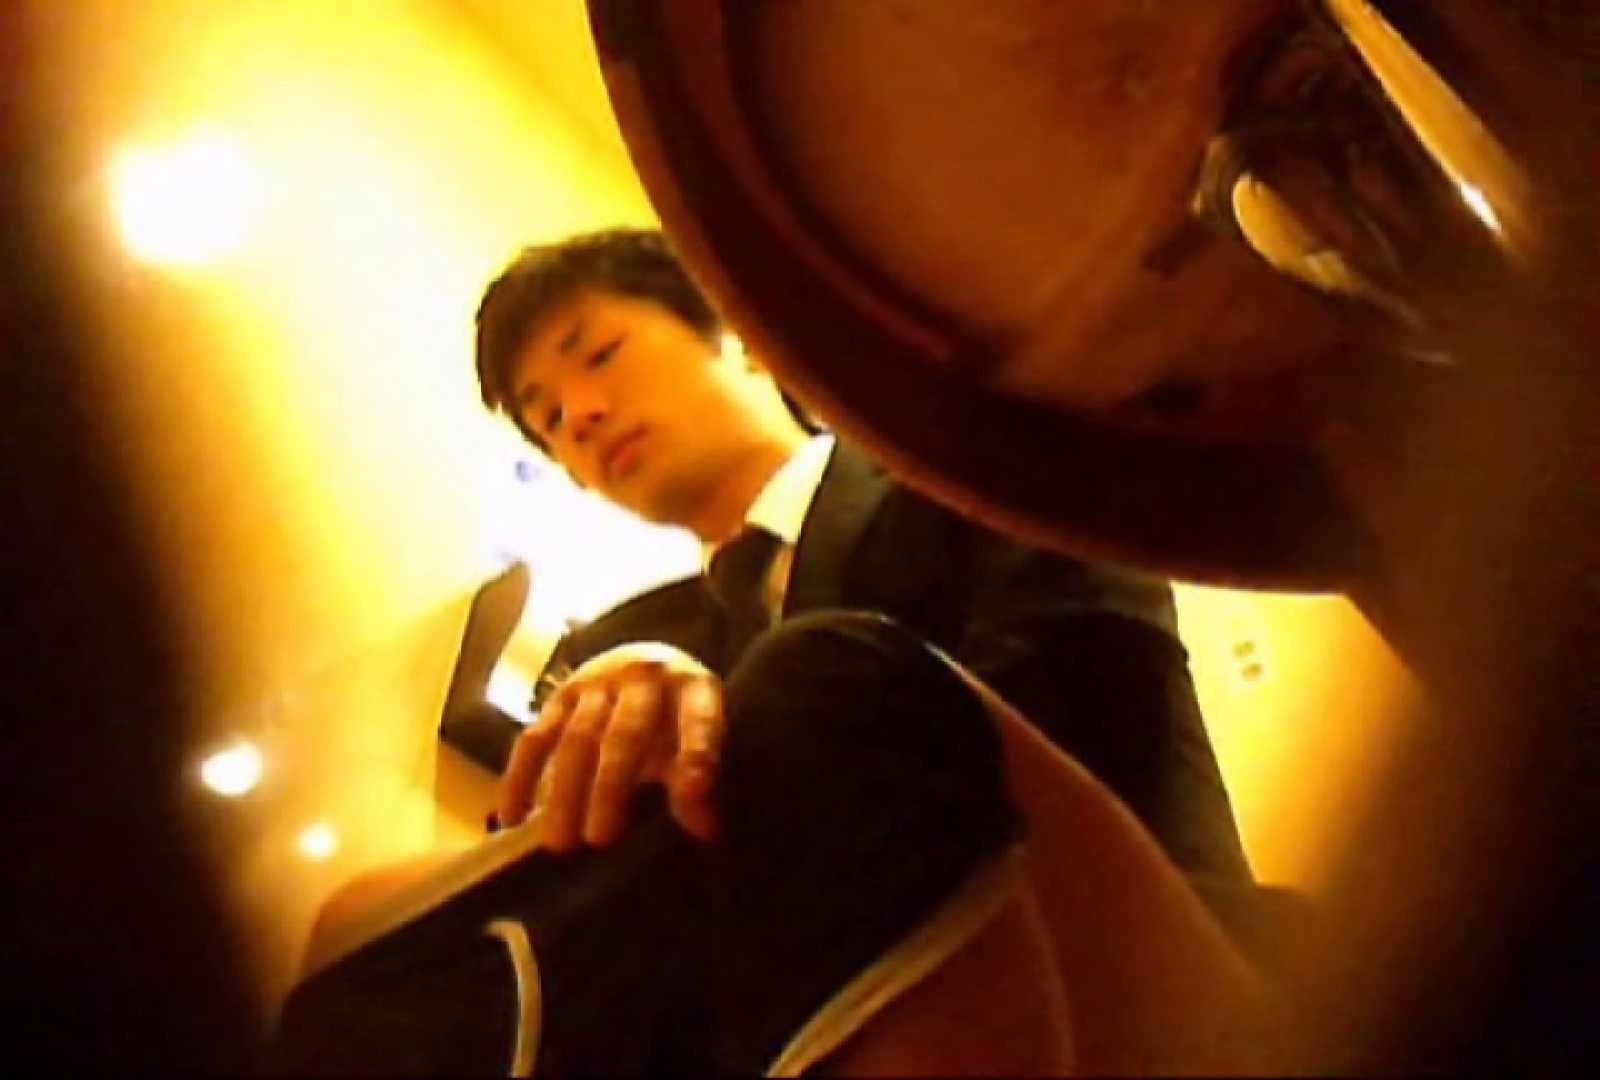 SEASON 3rd!掴み取りさんの洗面所覗き!in新幹線!VOL.23 リーマン系な男たち ゲイヌード画像 69連発 63